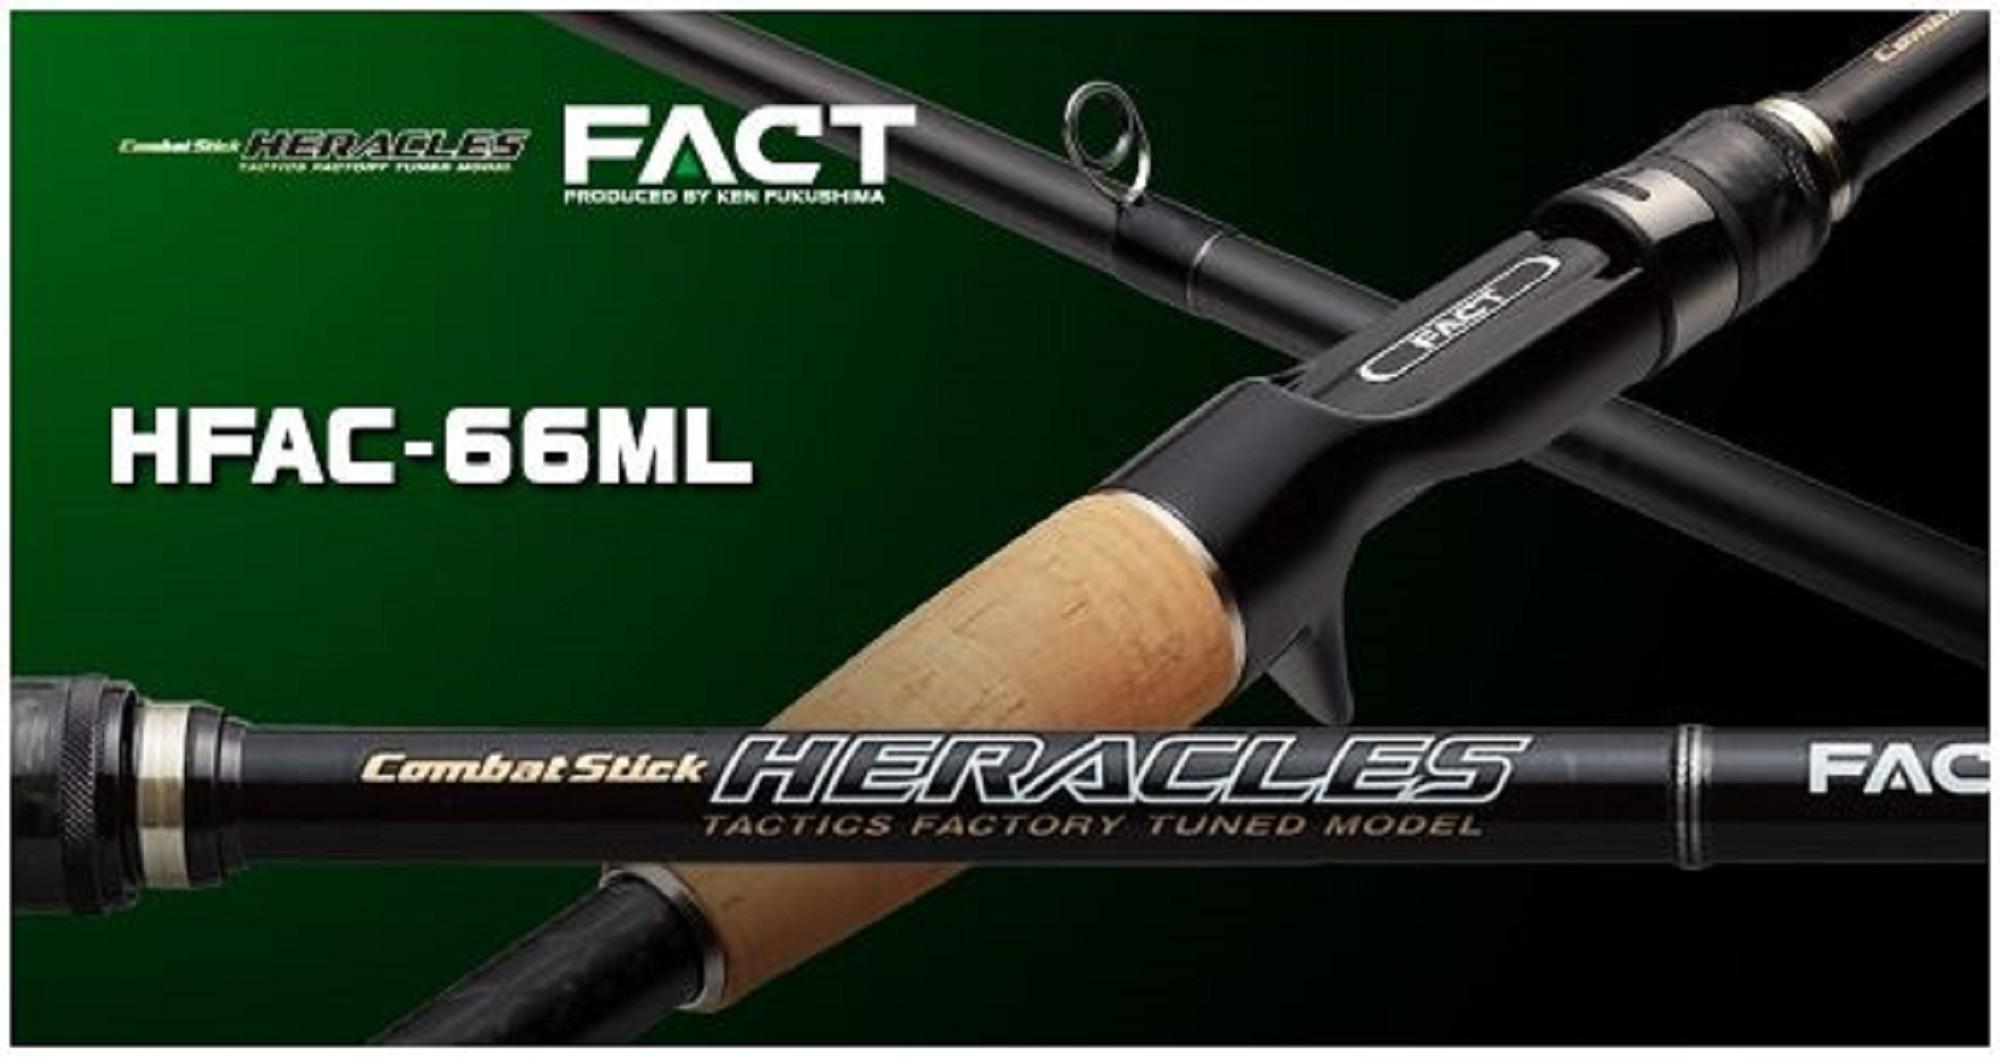 Evergreen Rod Baitcast Heracles Fact HFAC 66 ML (4181)